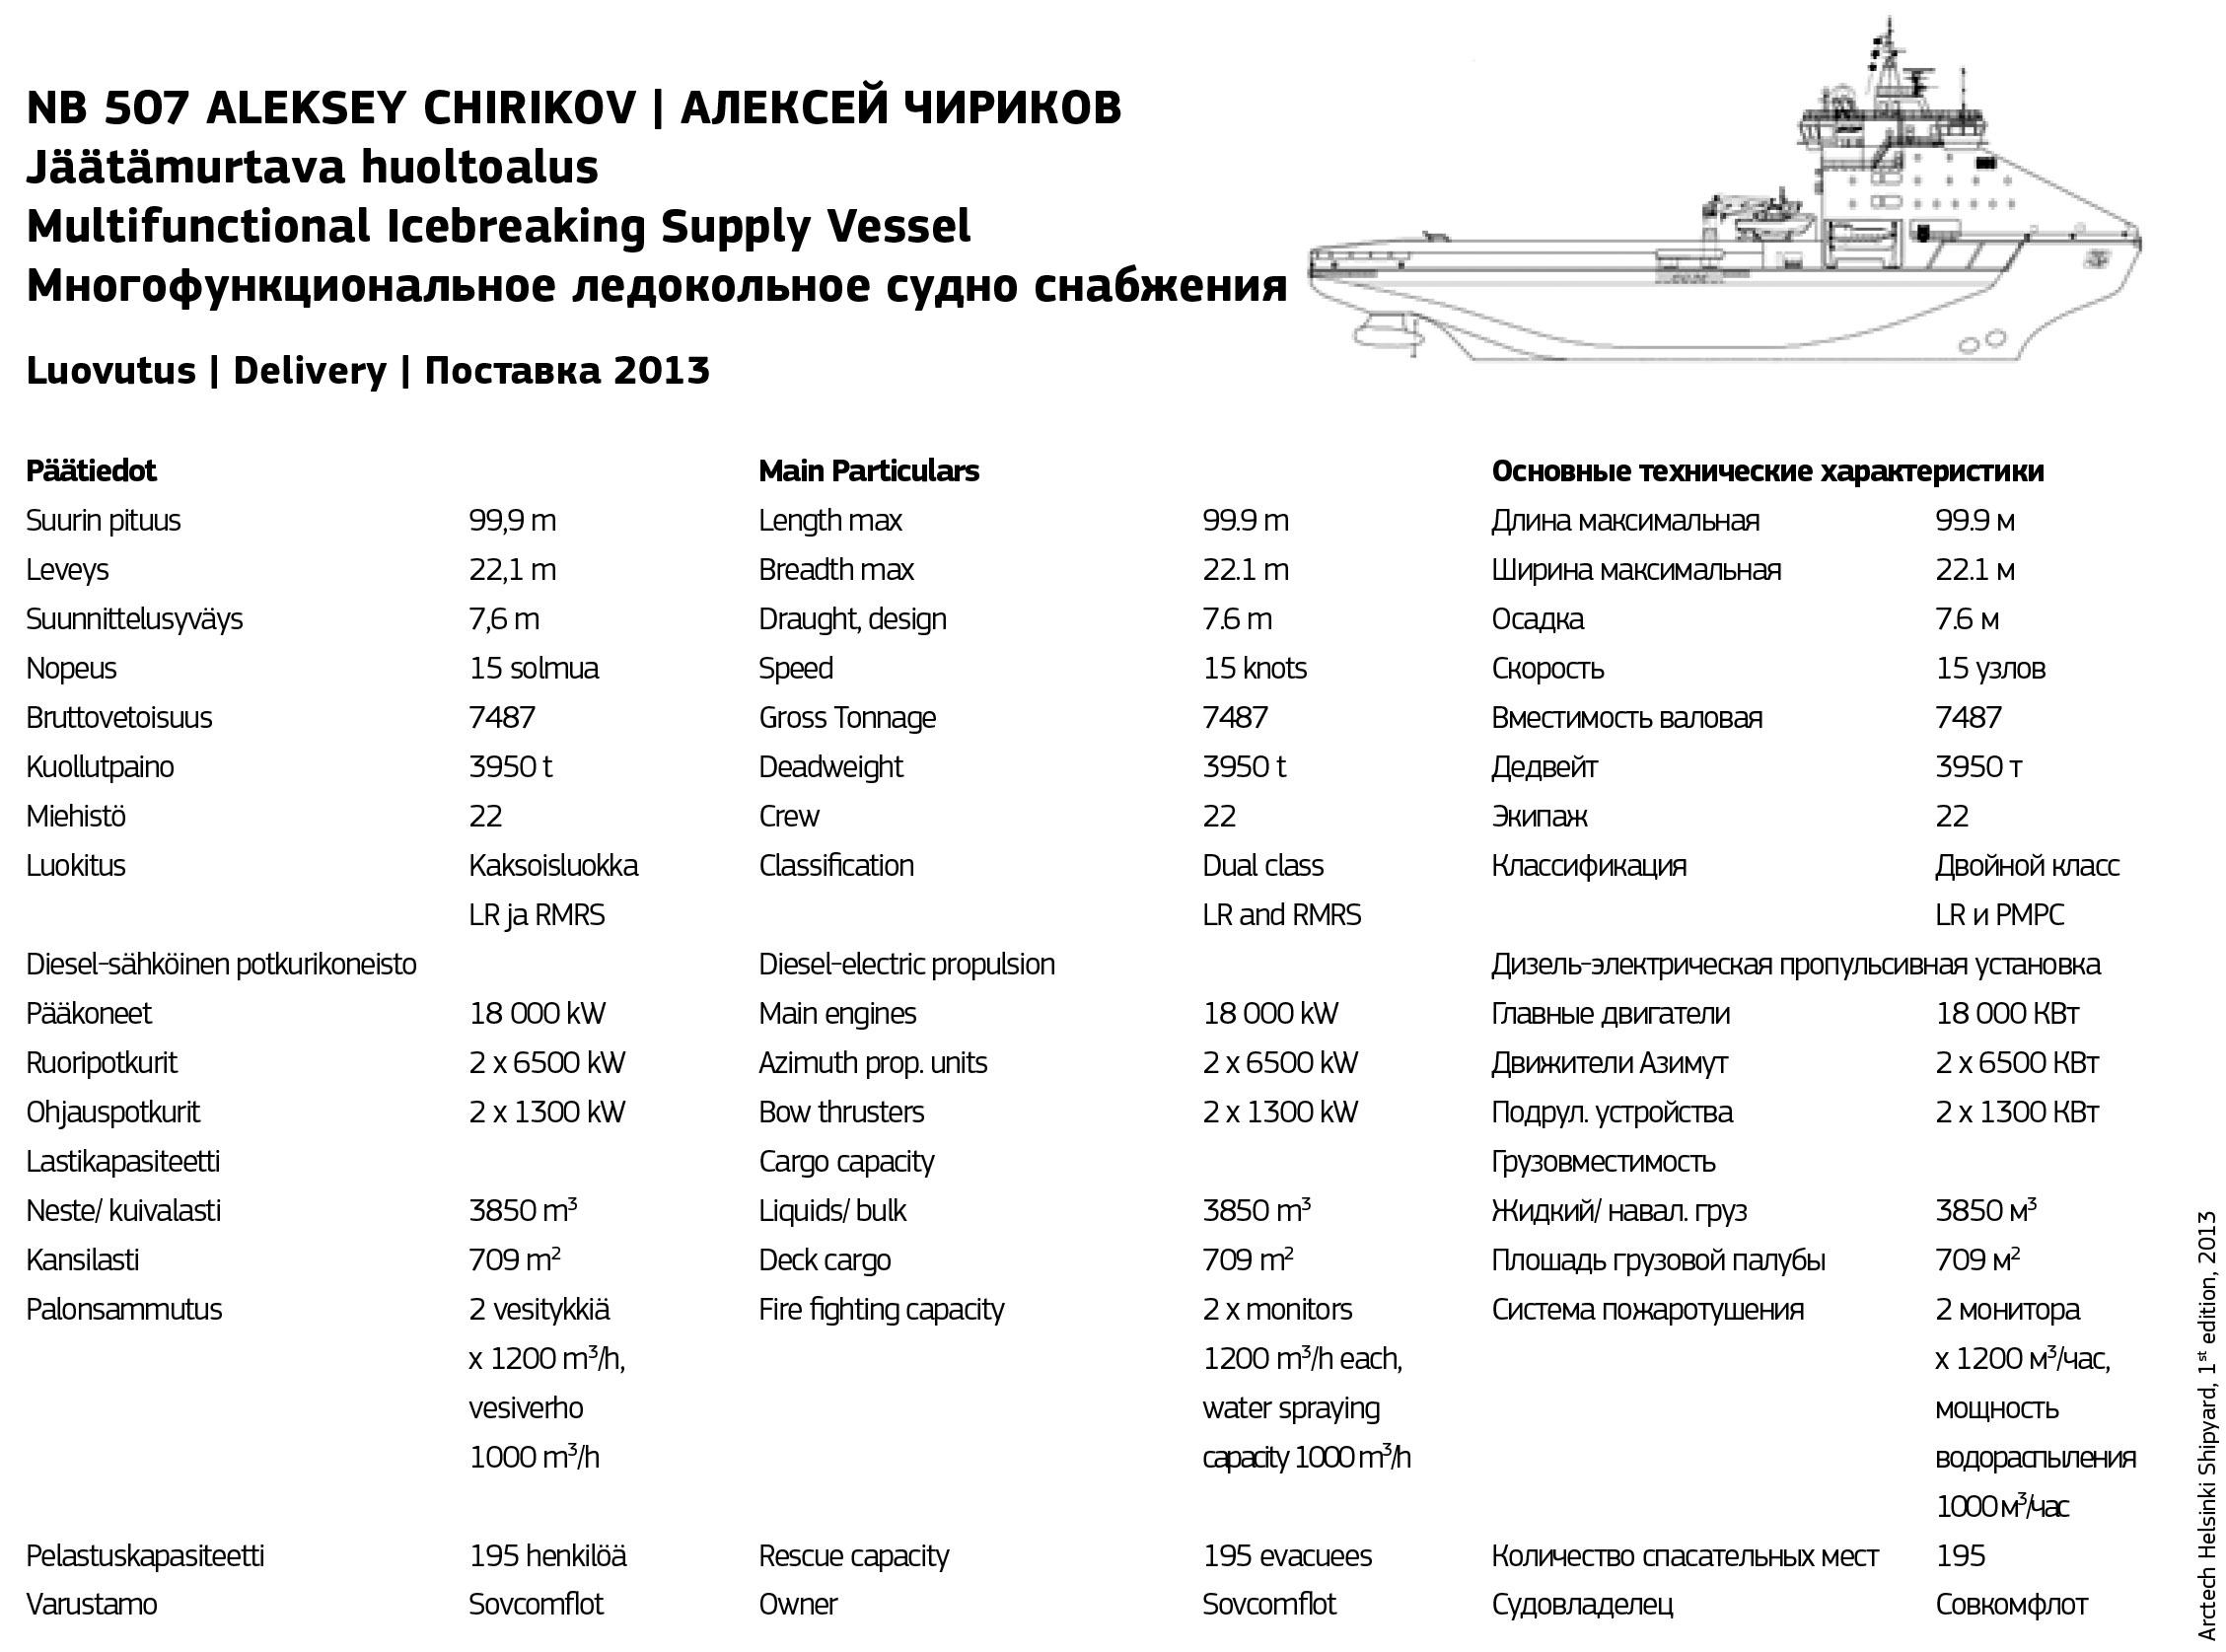 Aleksey_Chirikov_2.jpg